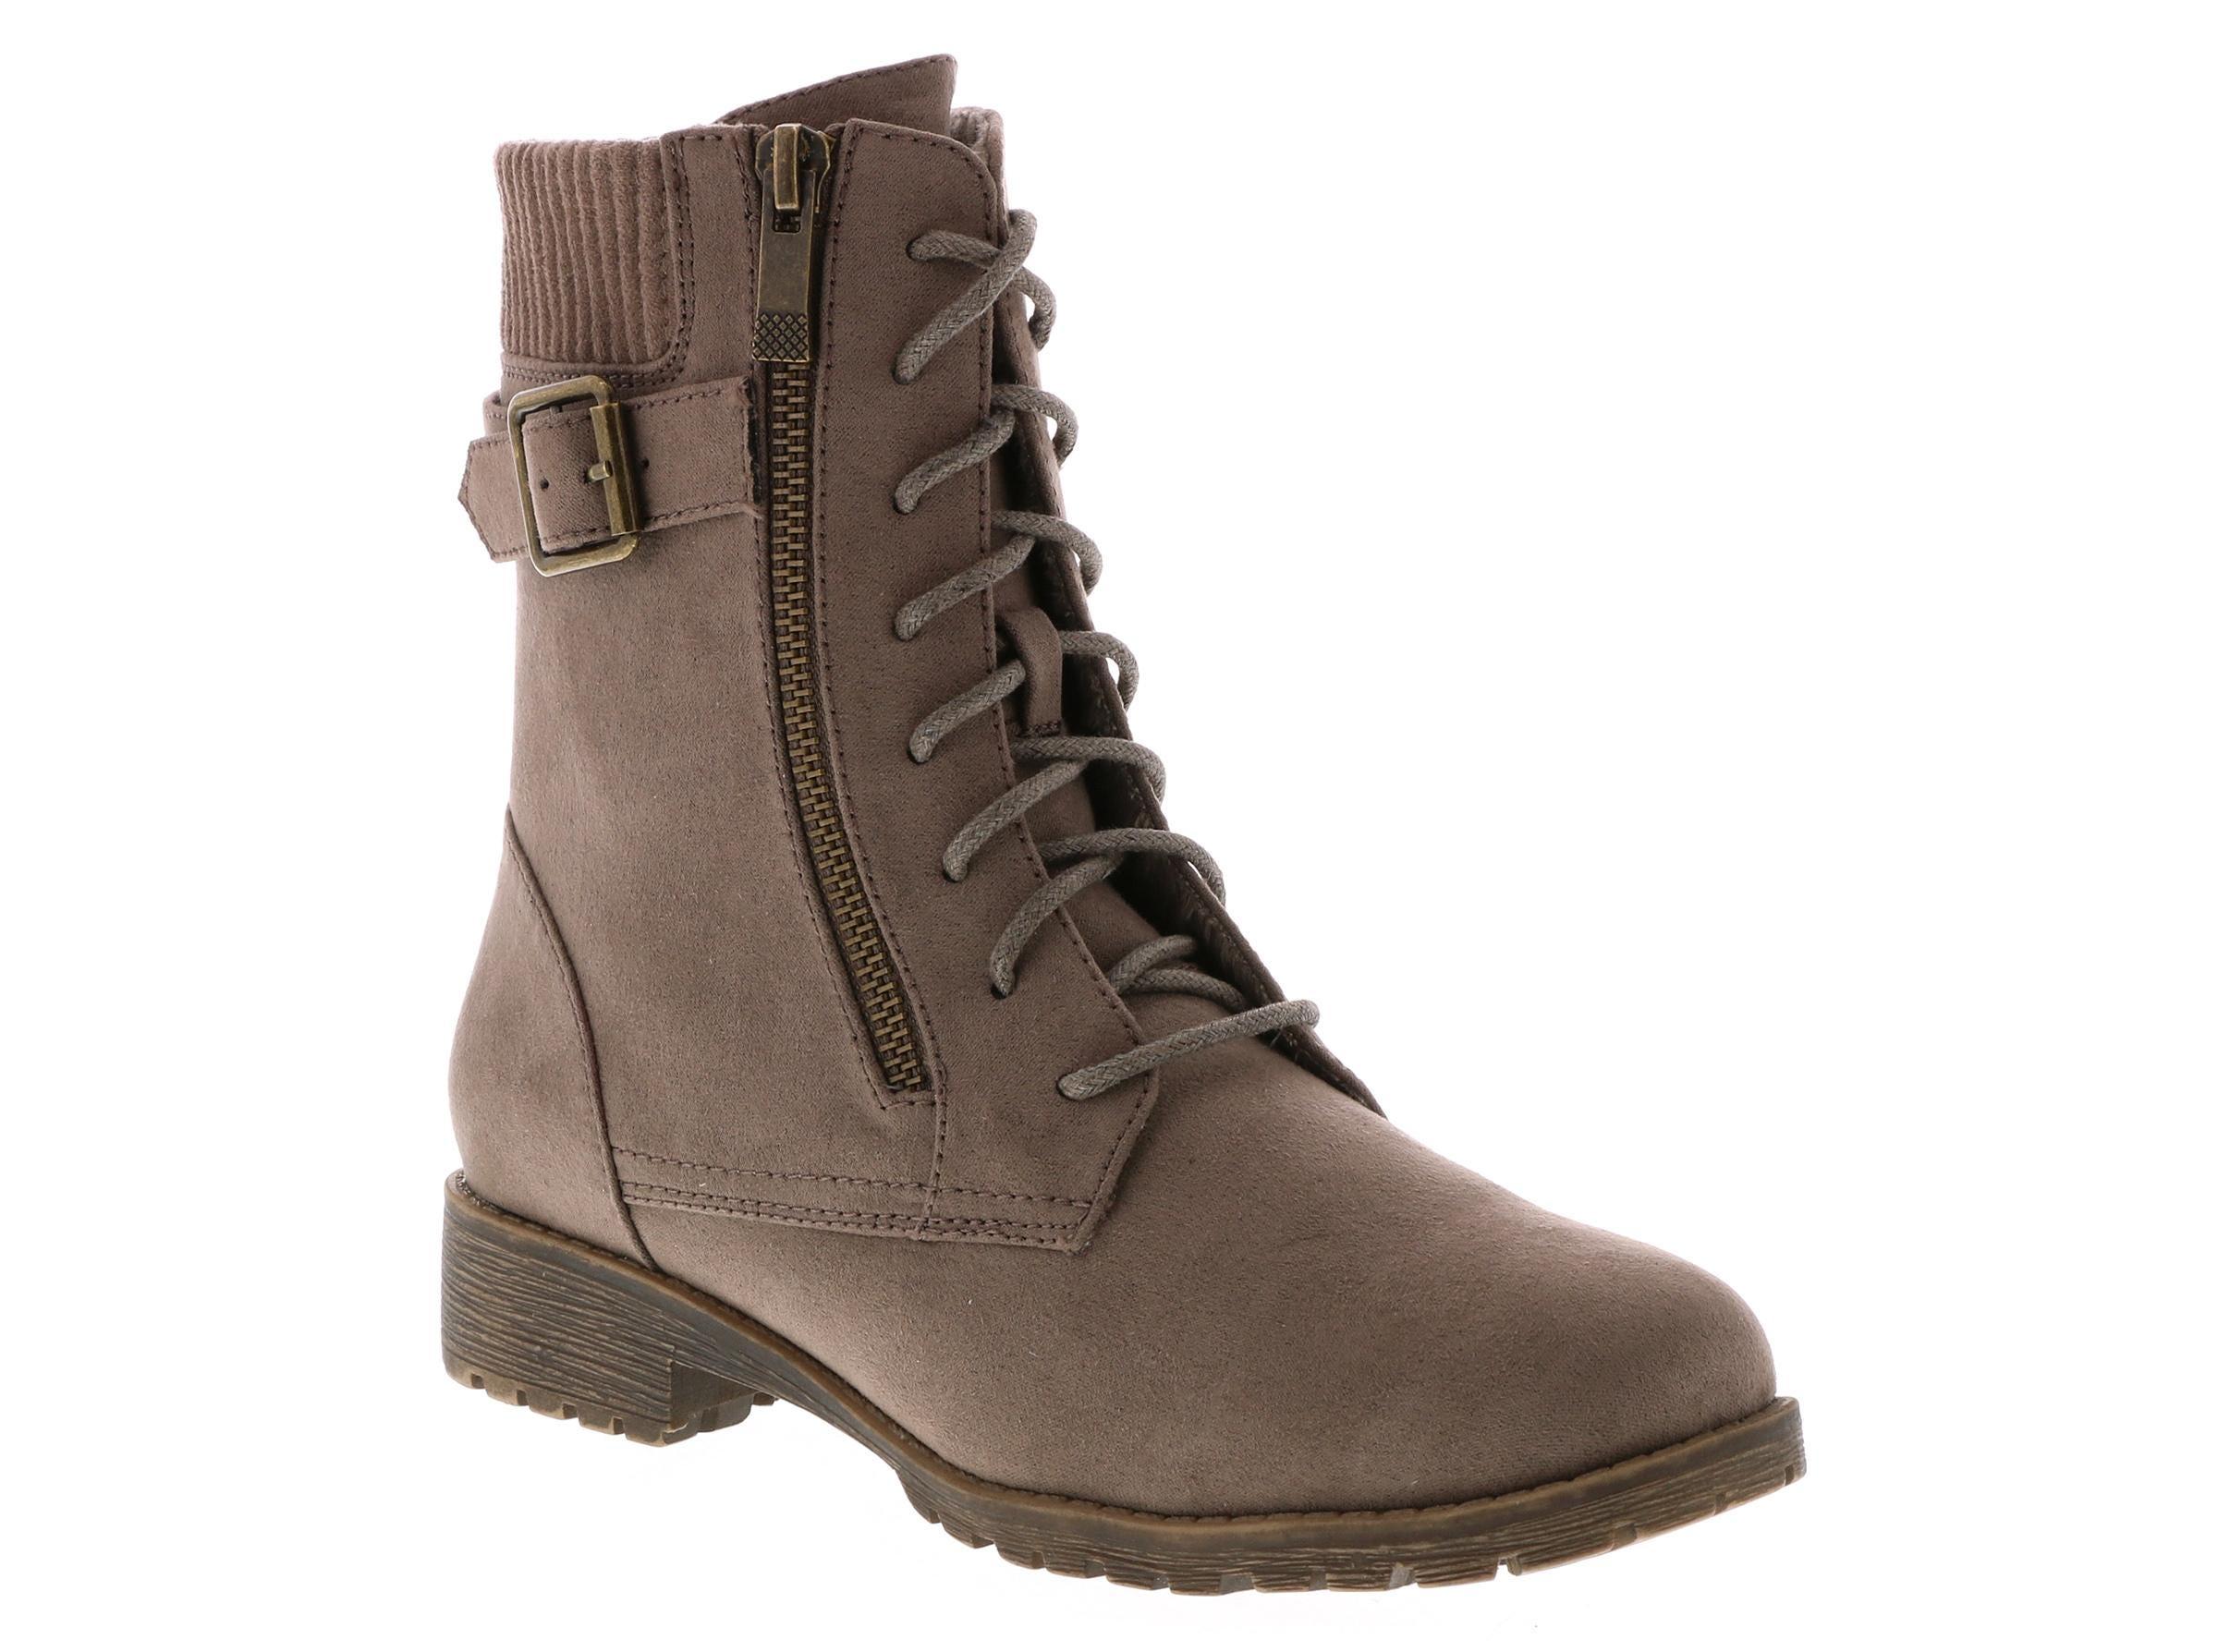 6a3fb560aa7 Women's Echo Bay Warrior Taupe | Shoe Sensation